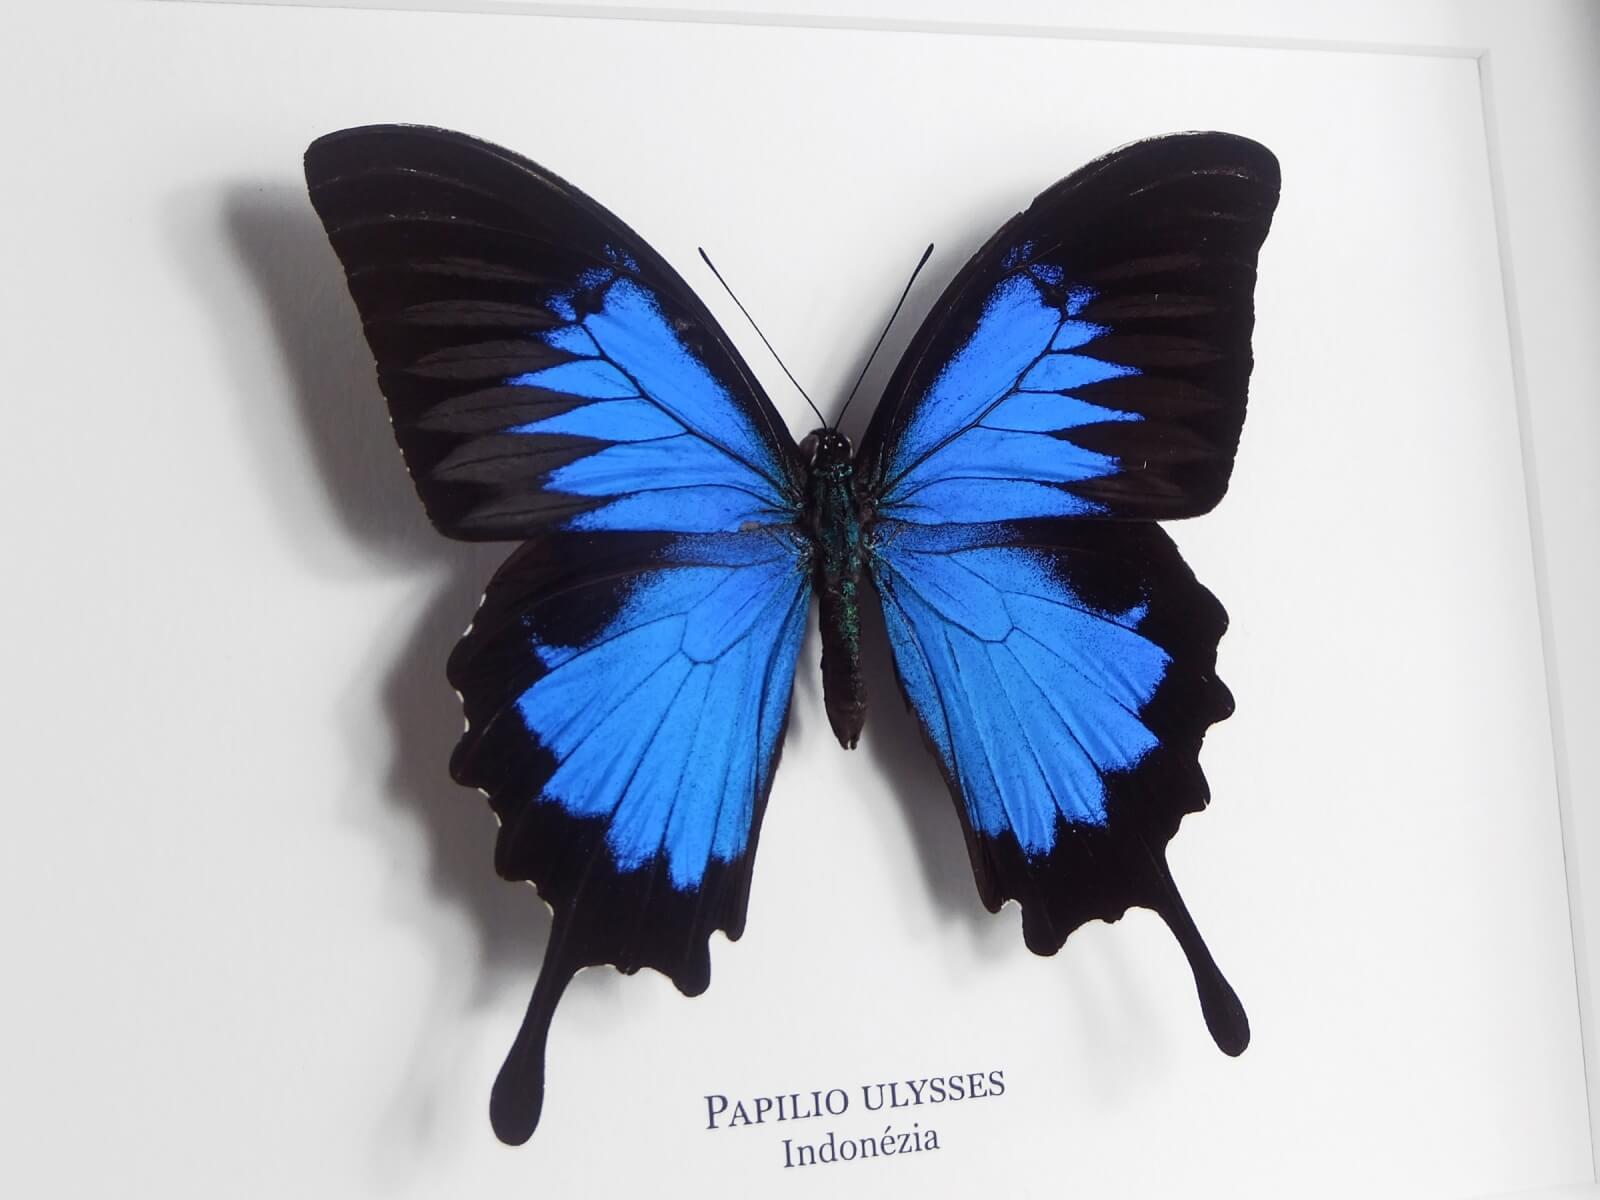 Papilio ulysses, fehér keretben | #1930